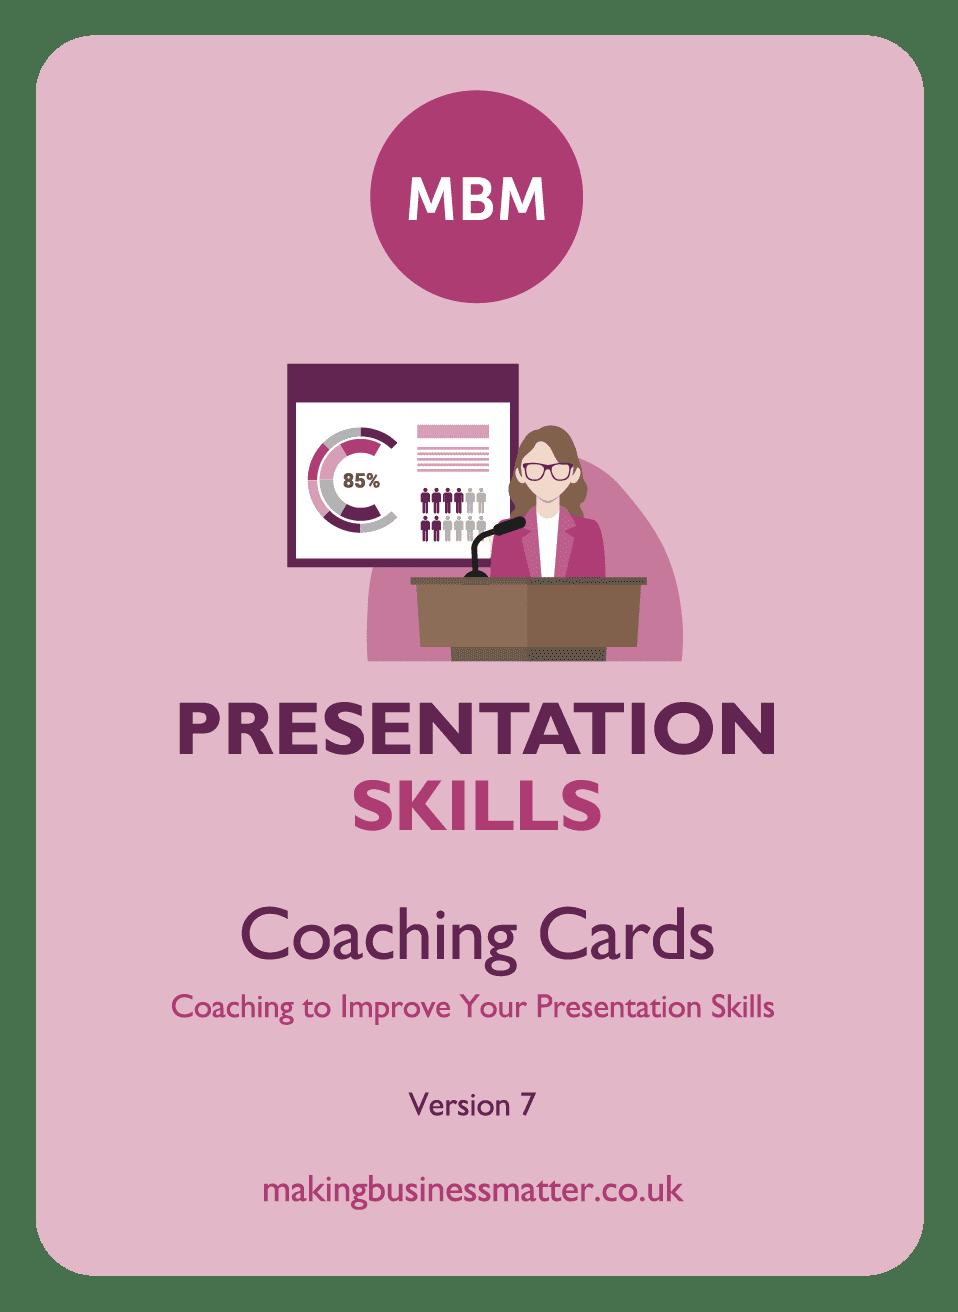 Coaching card titled Presentation Skills